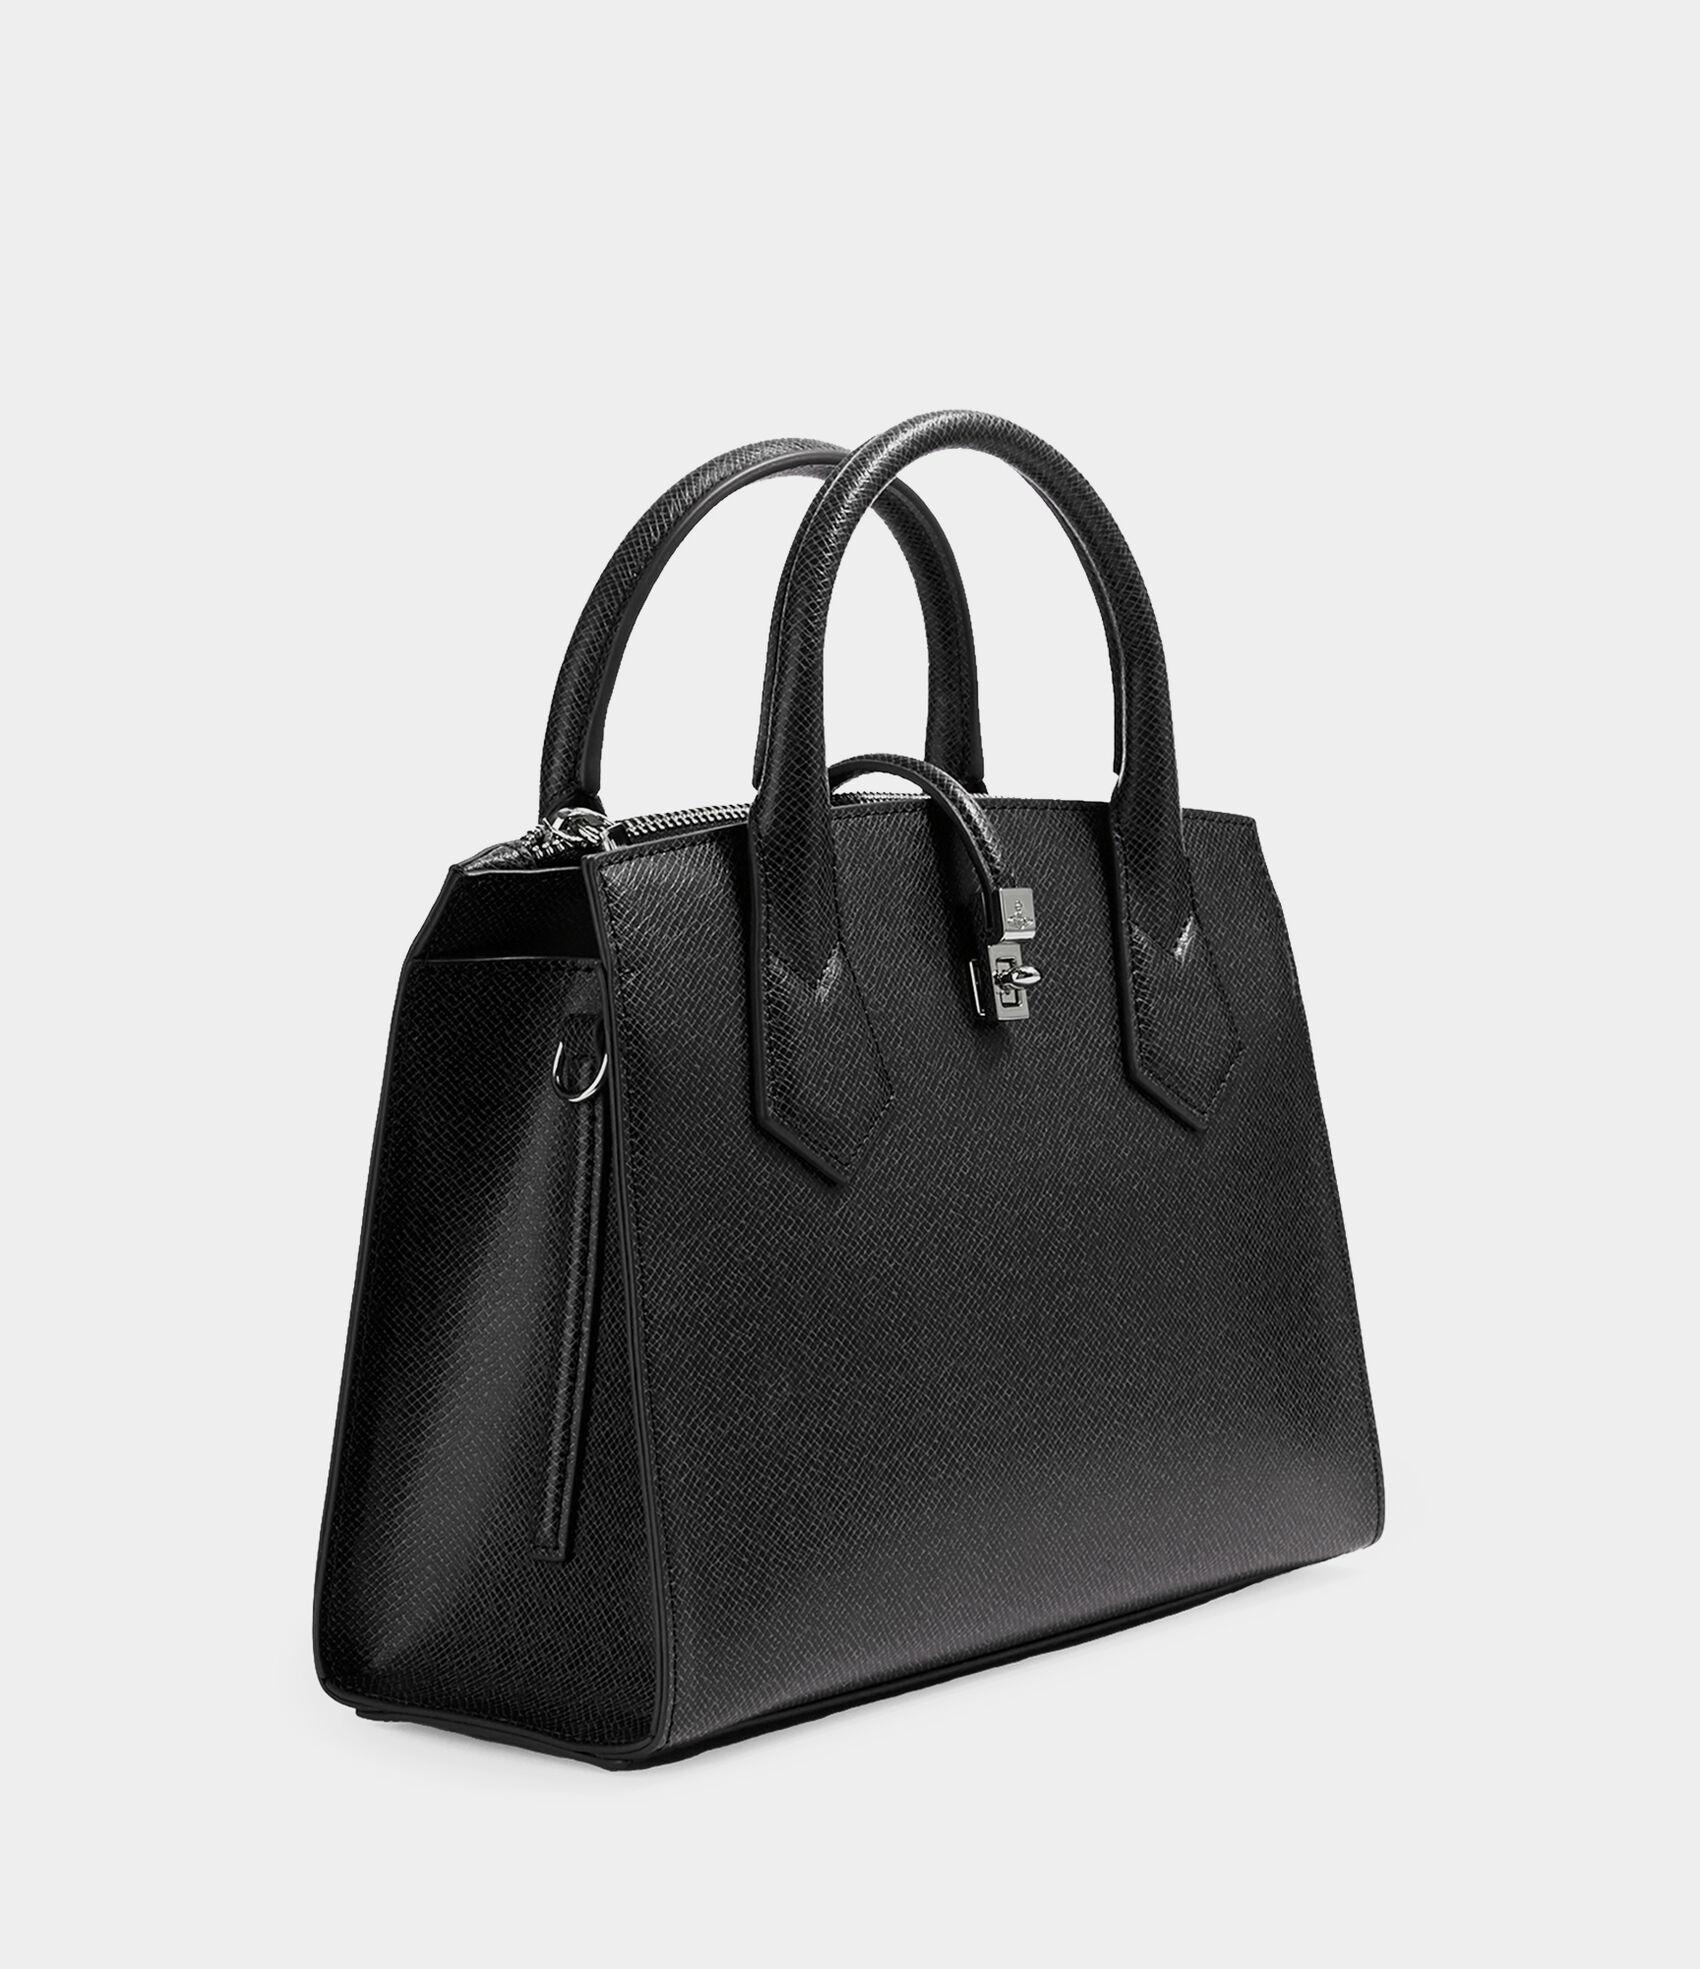 b0c435ada6 Vivienne Westwood Women s Designer Handbags